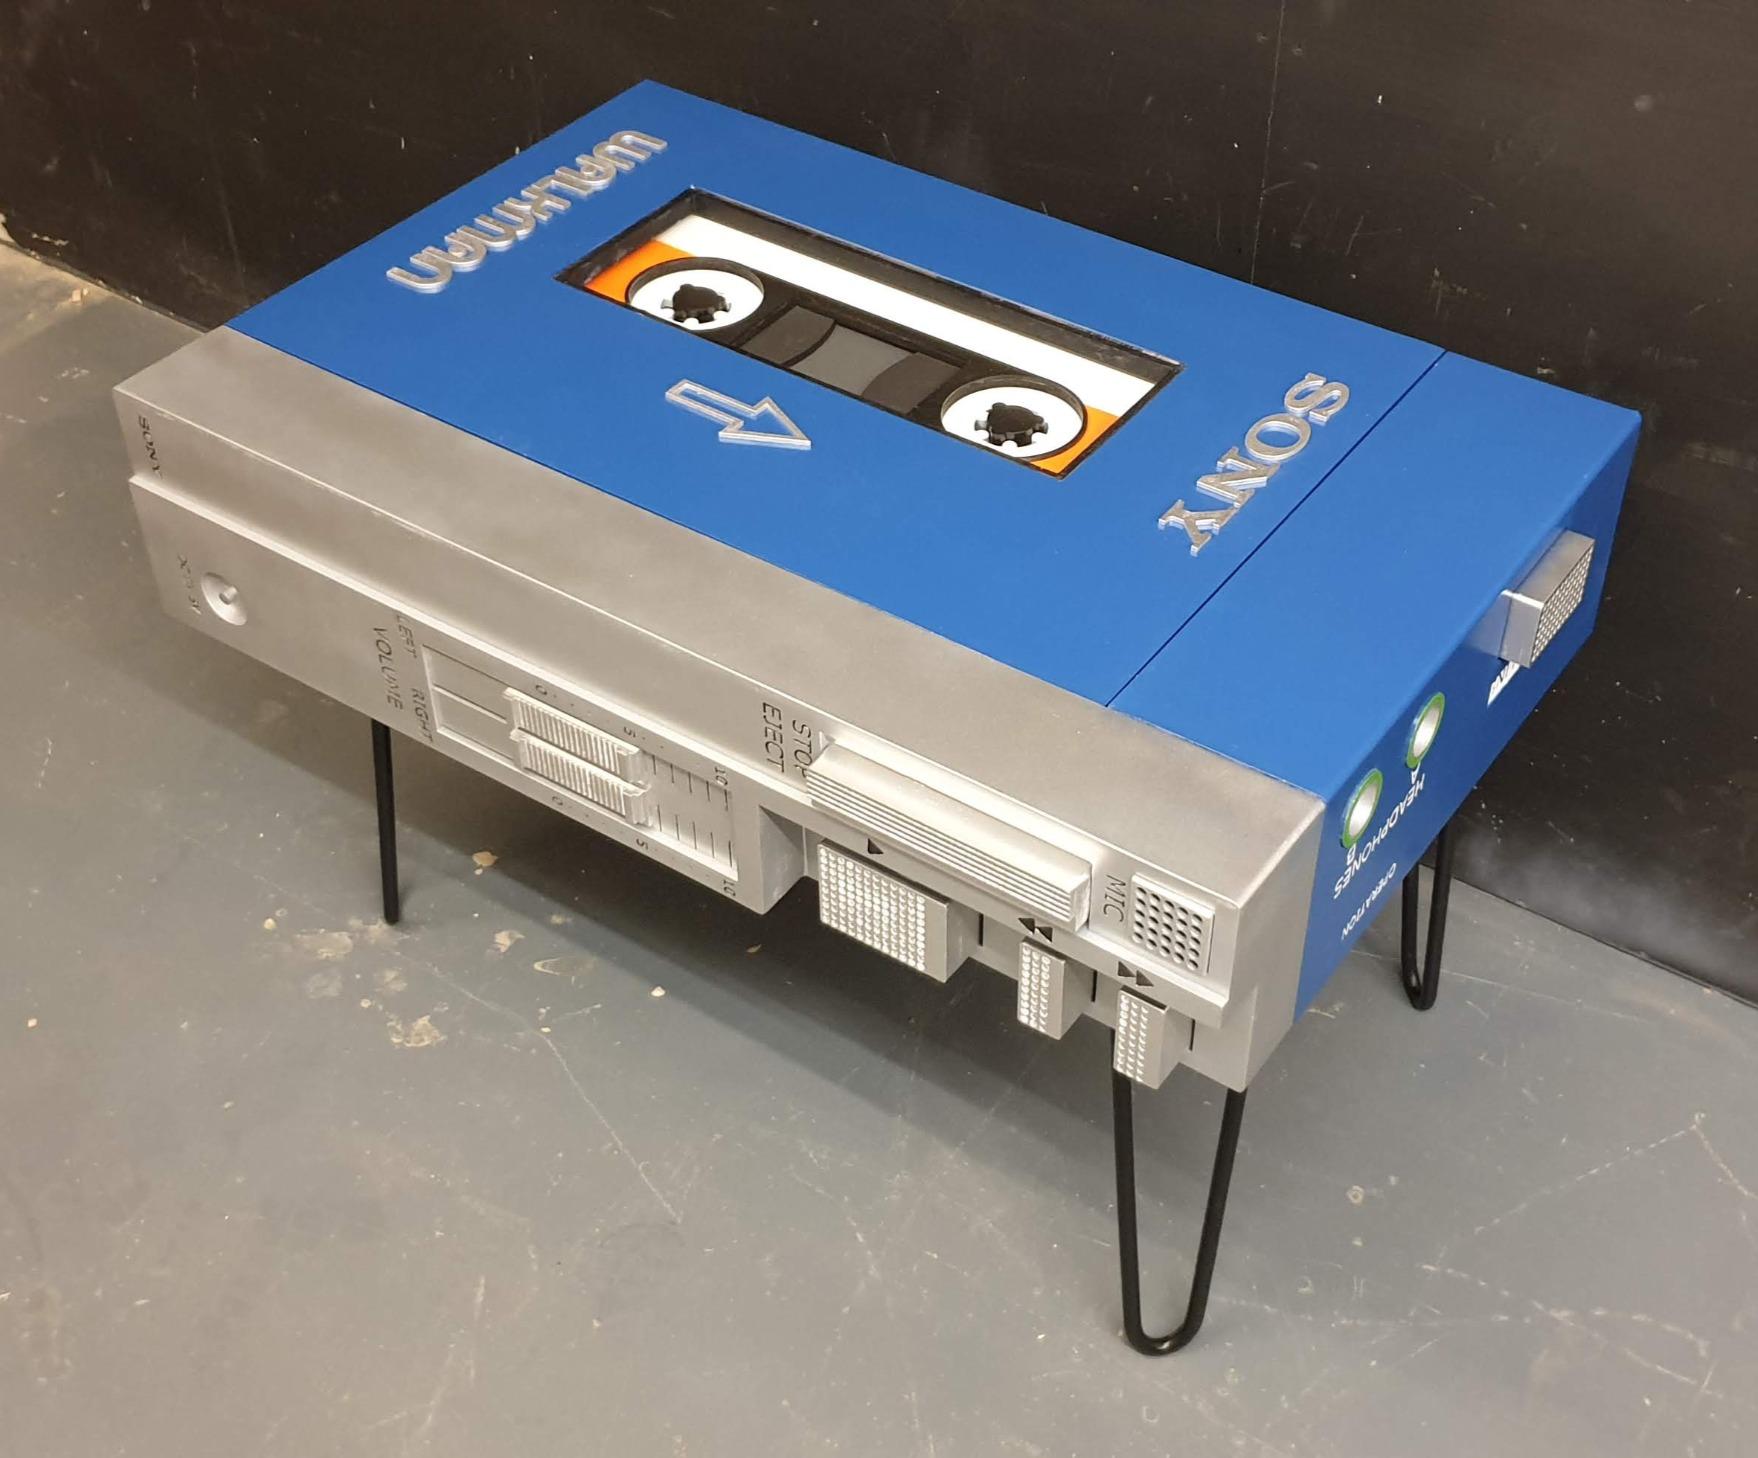 Walkman Table 1